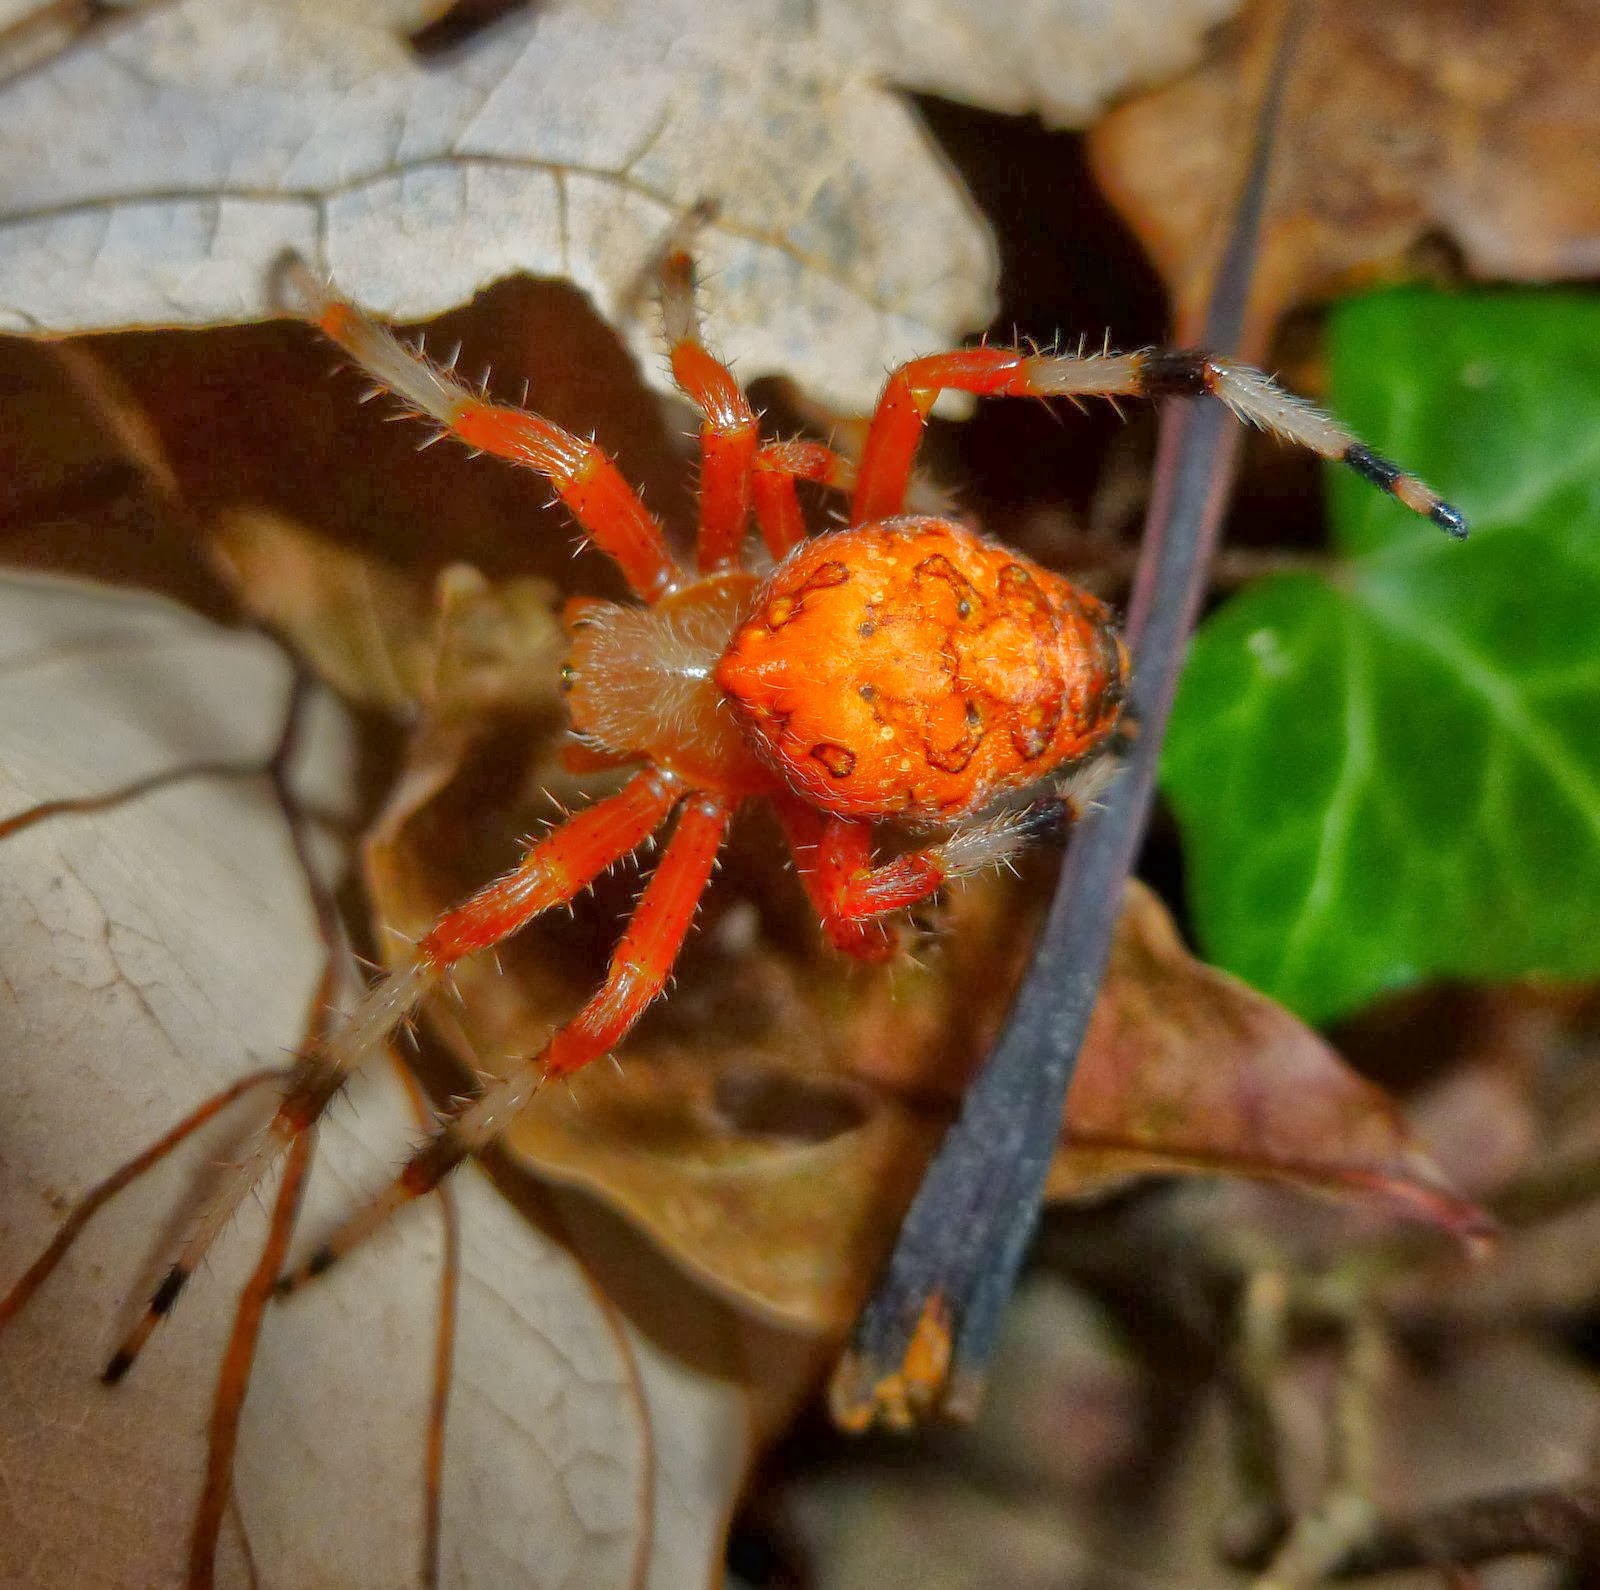 Search orange spiders at Spider ID Large orange spider pictures